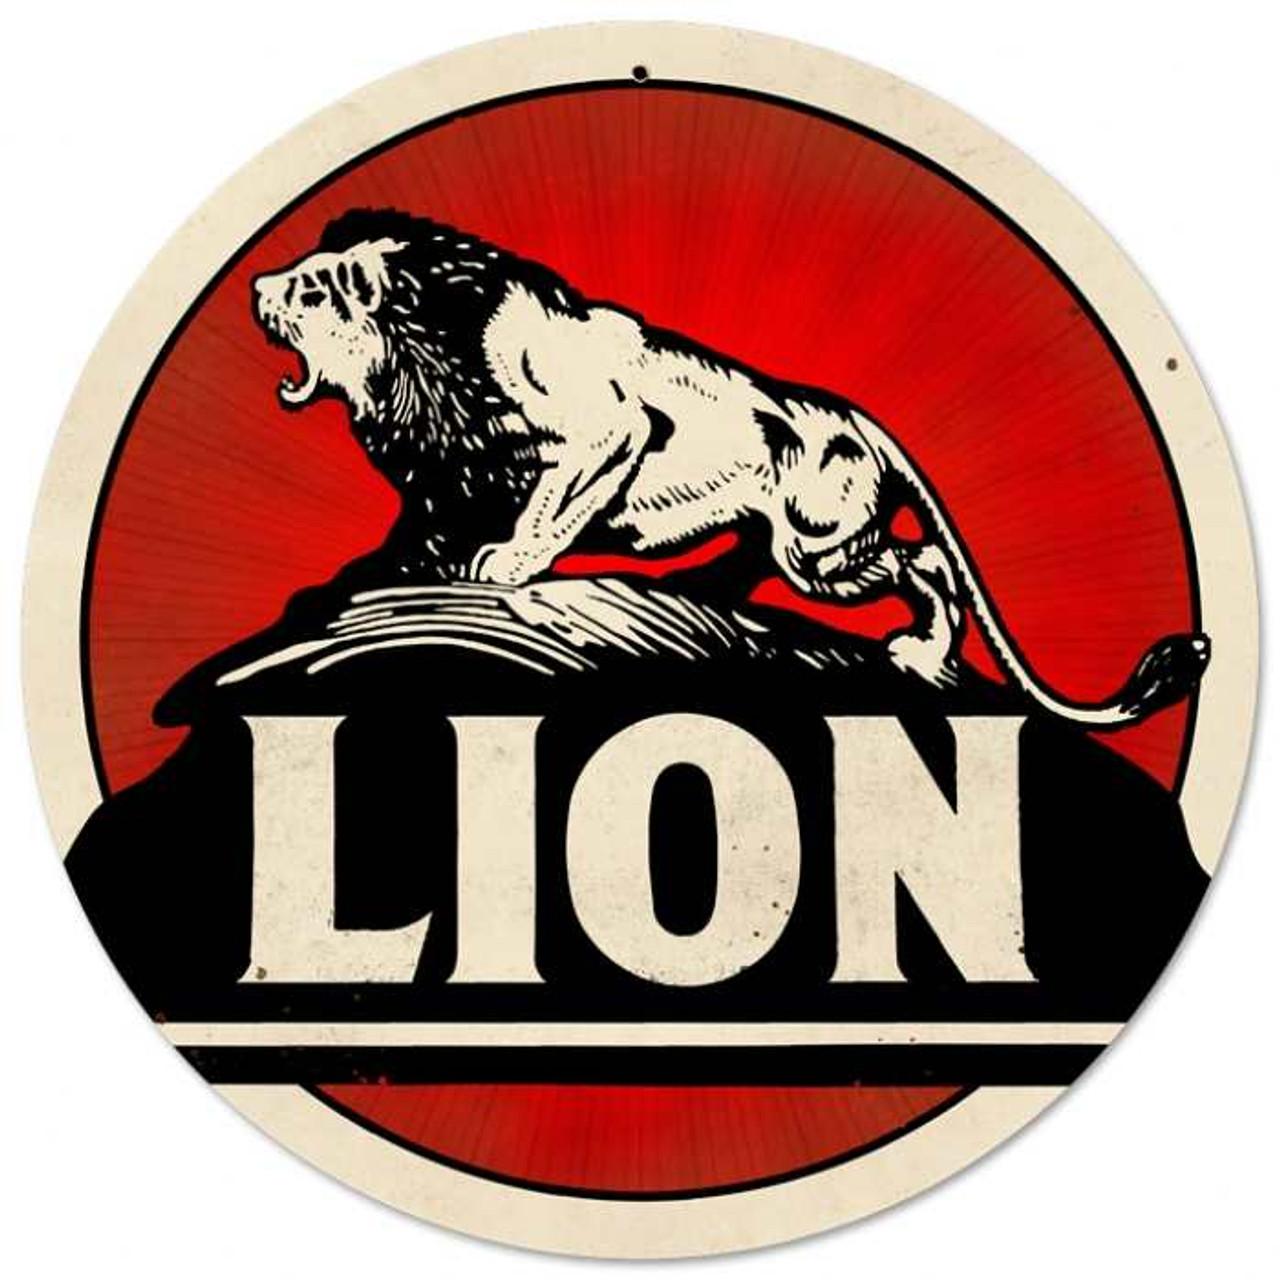 Retro Lion Gasoline Round Metal Sign 28 x 28 Inches